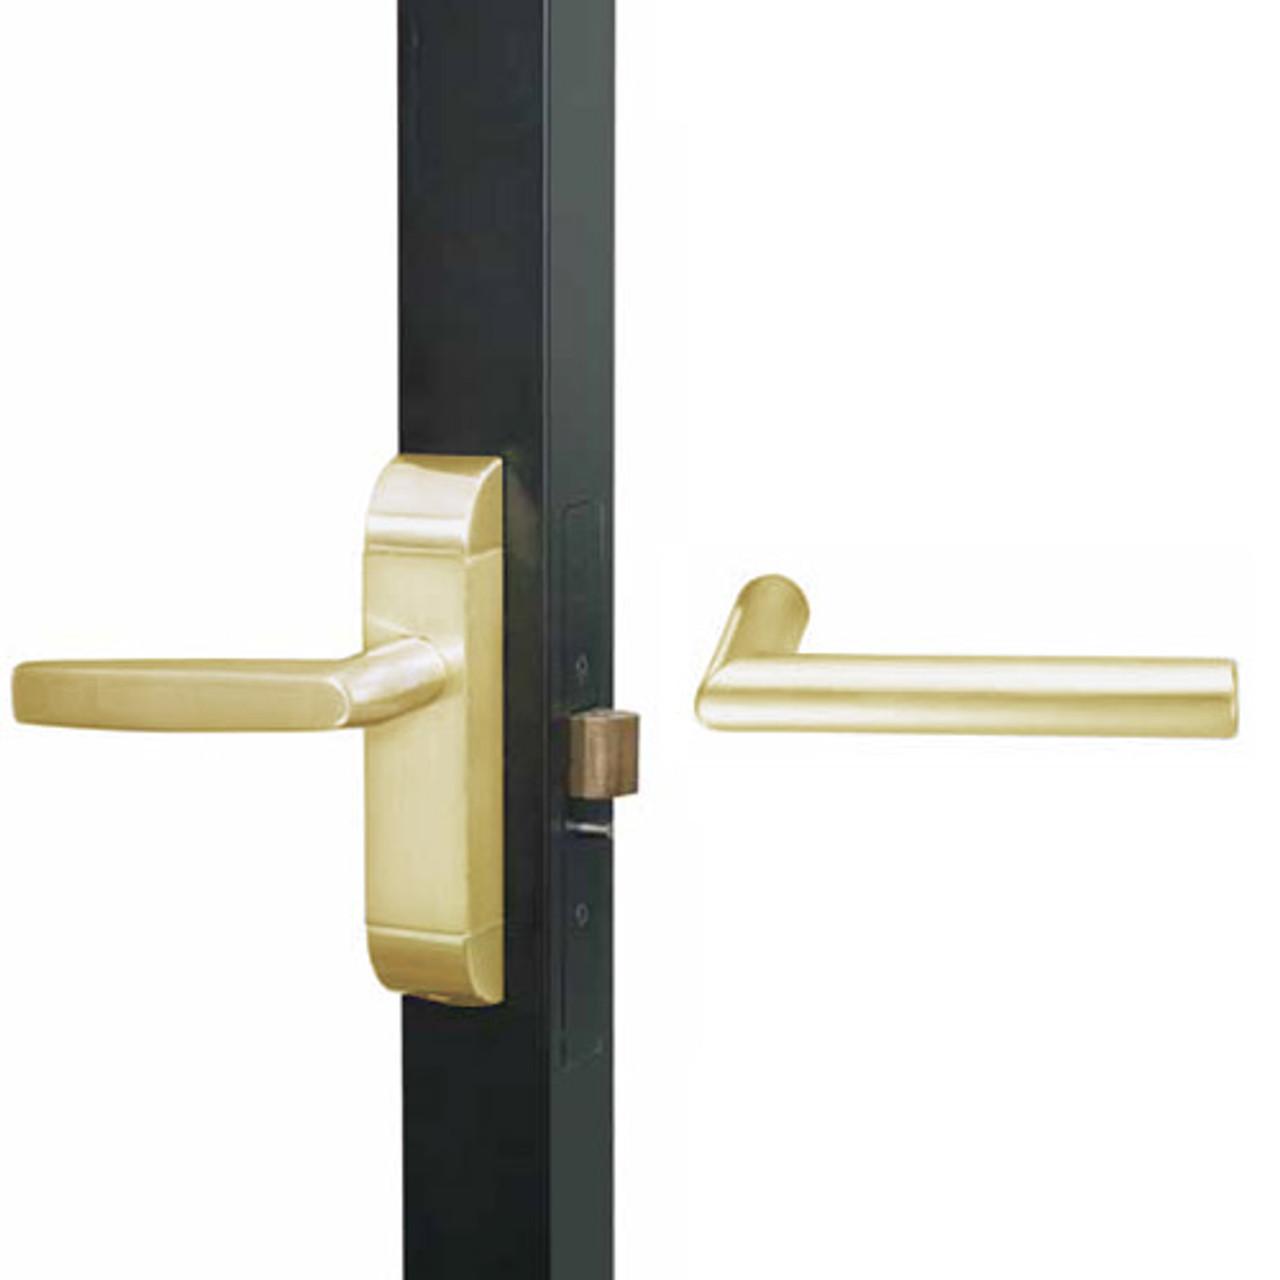 4600-MI-532-US4 Adams Rite MI Designer Deadlatch handle in Satin Brass Finish